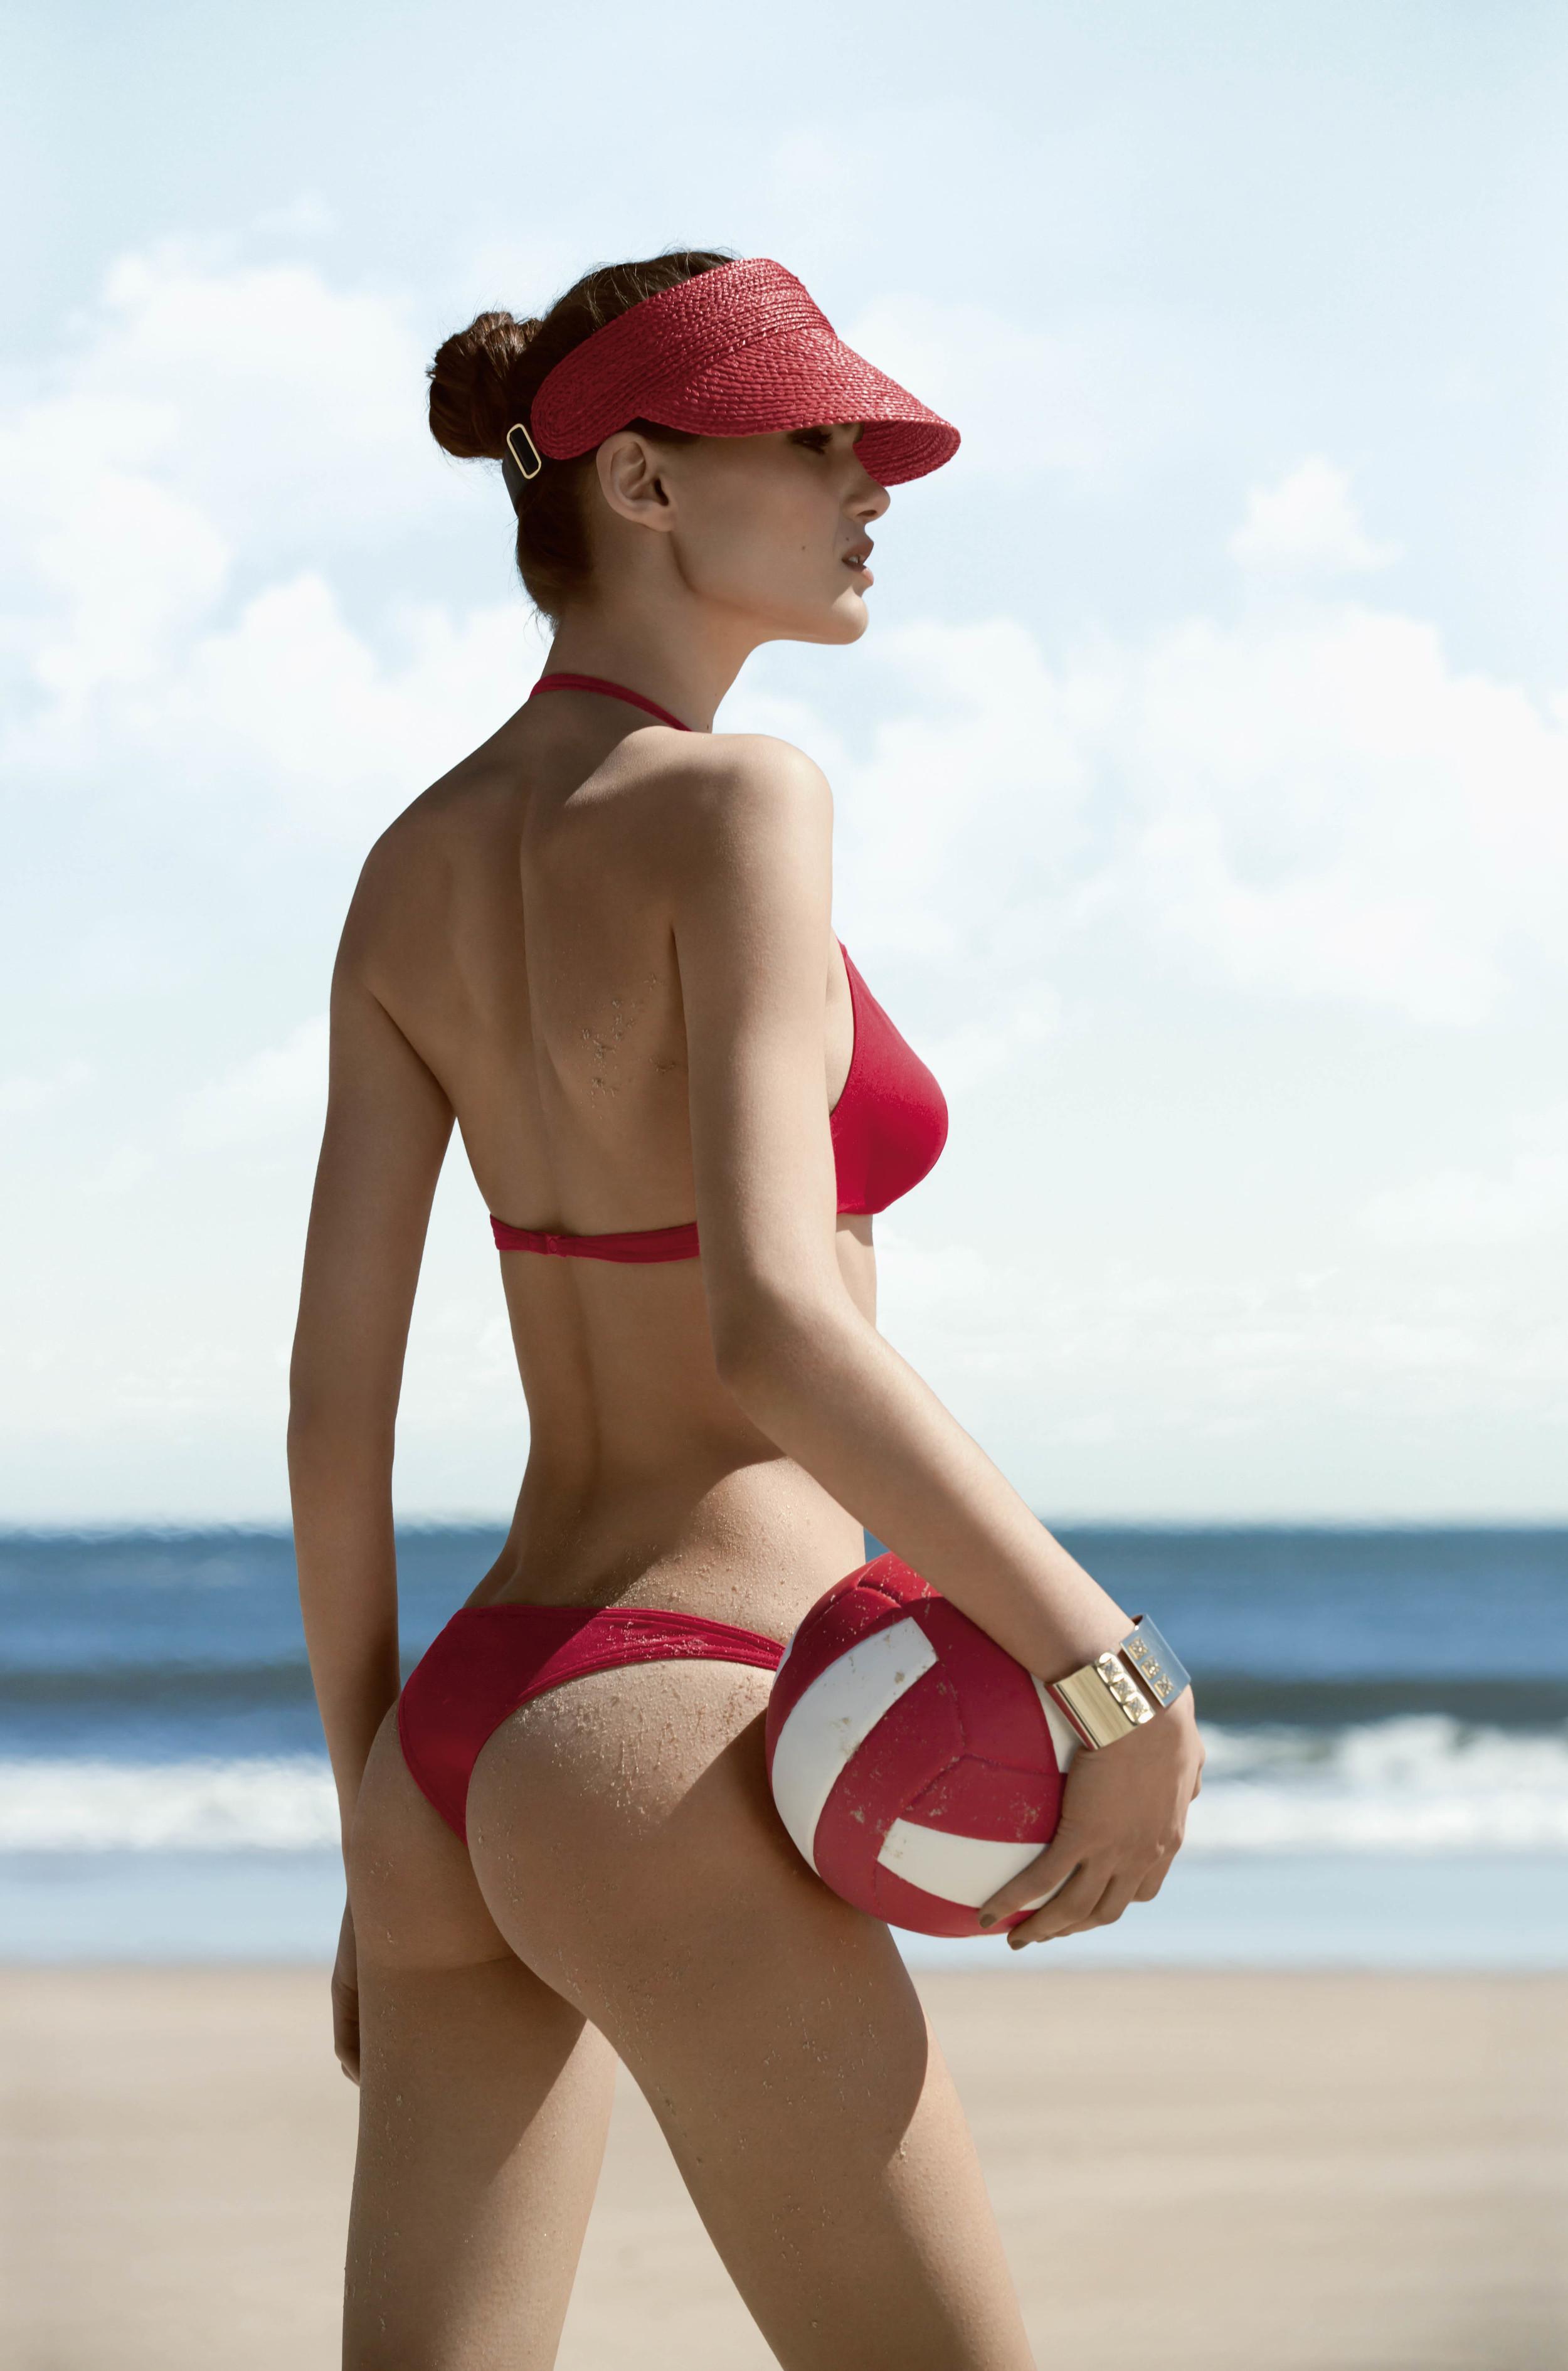 Ny swimsuit photographer -.jpg